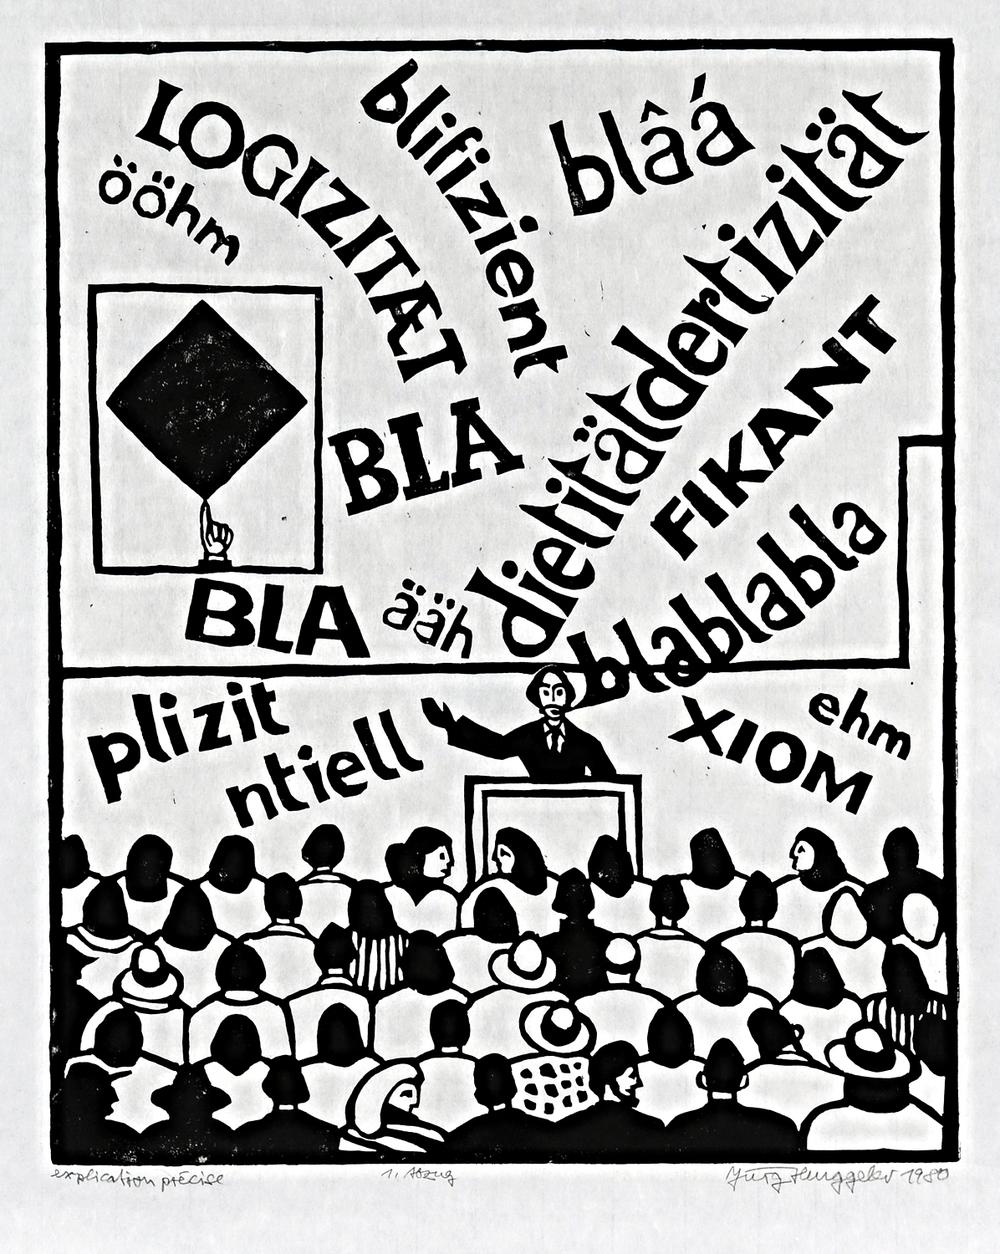 Explication précise, 1980